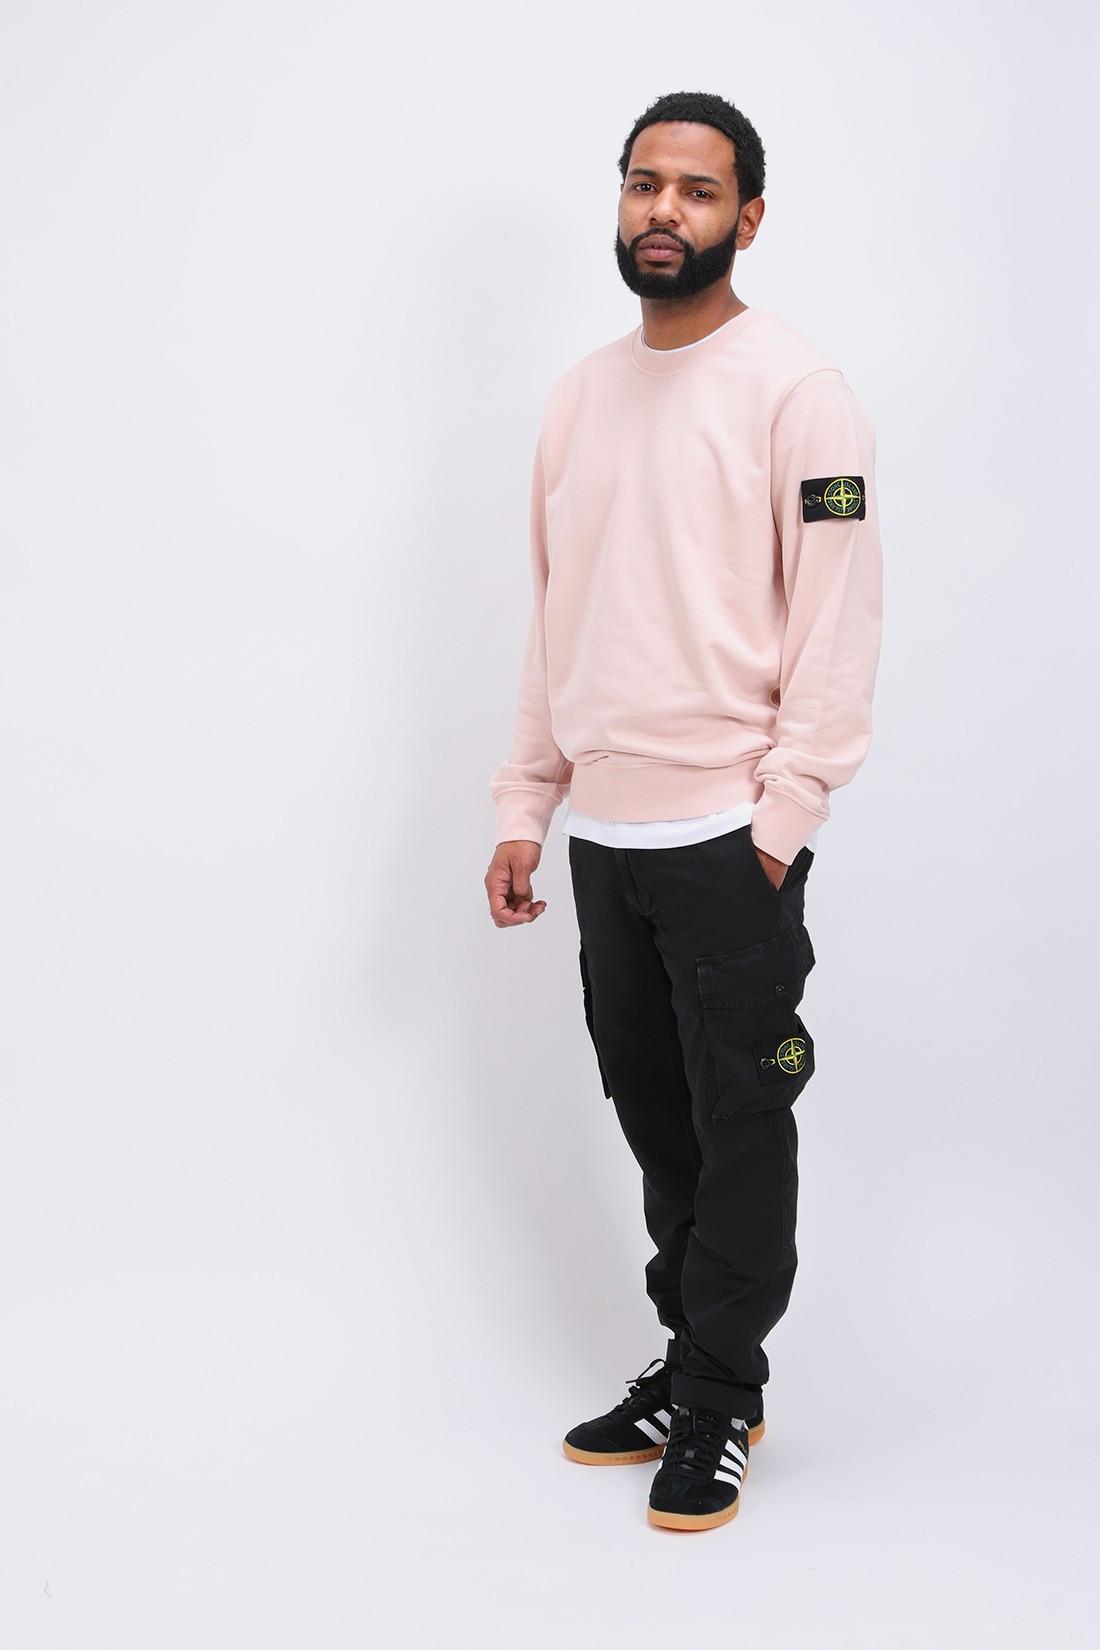 STONE ISLAND / 63051 crewneck sweater v0082 Rosa antico